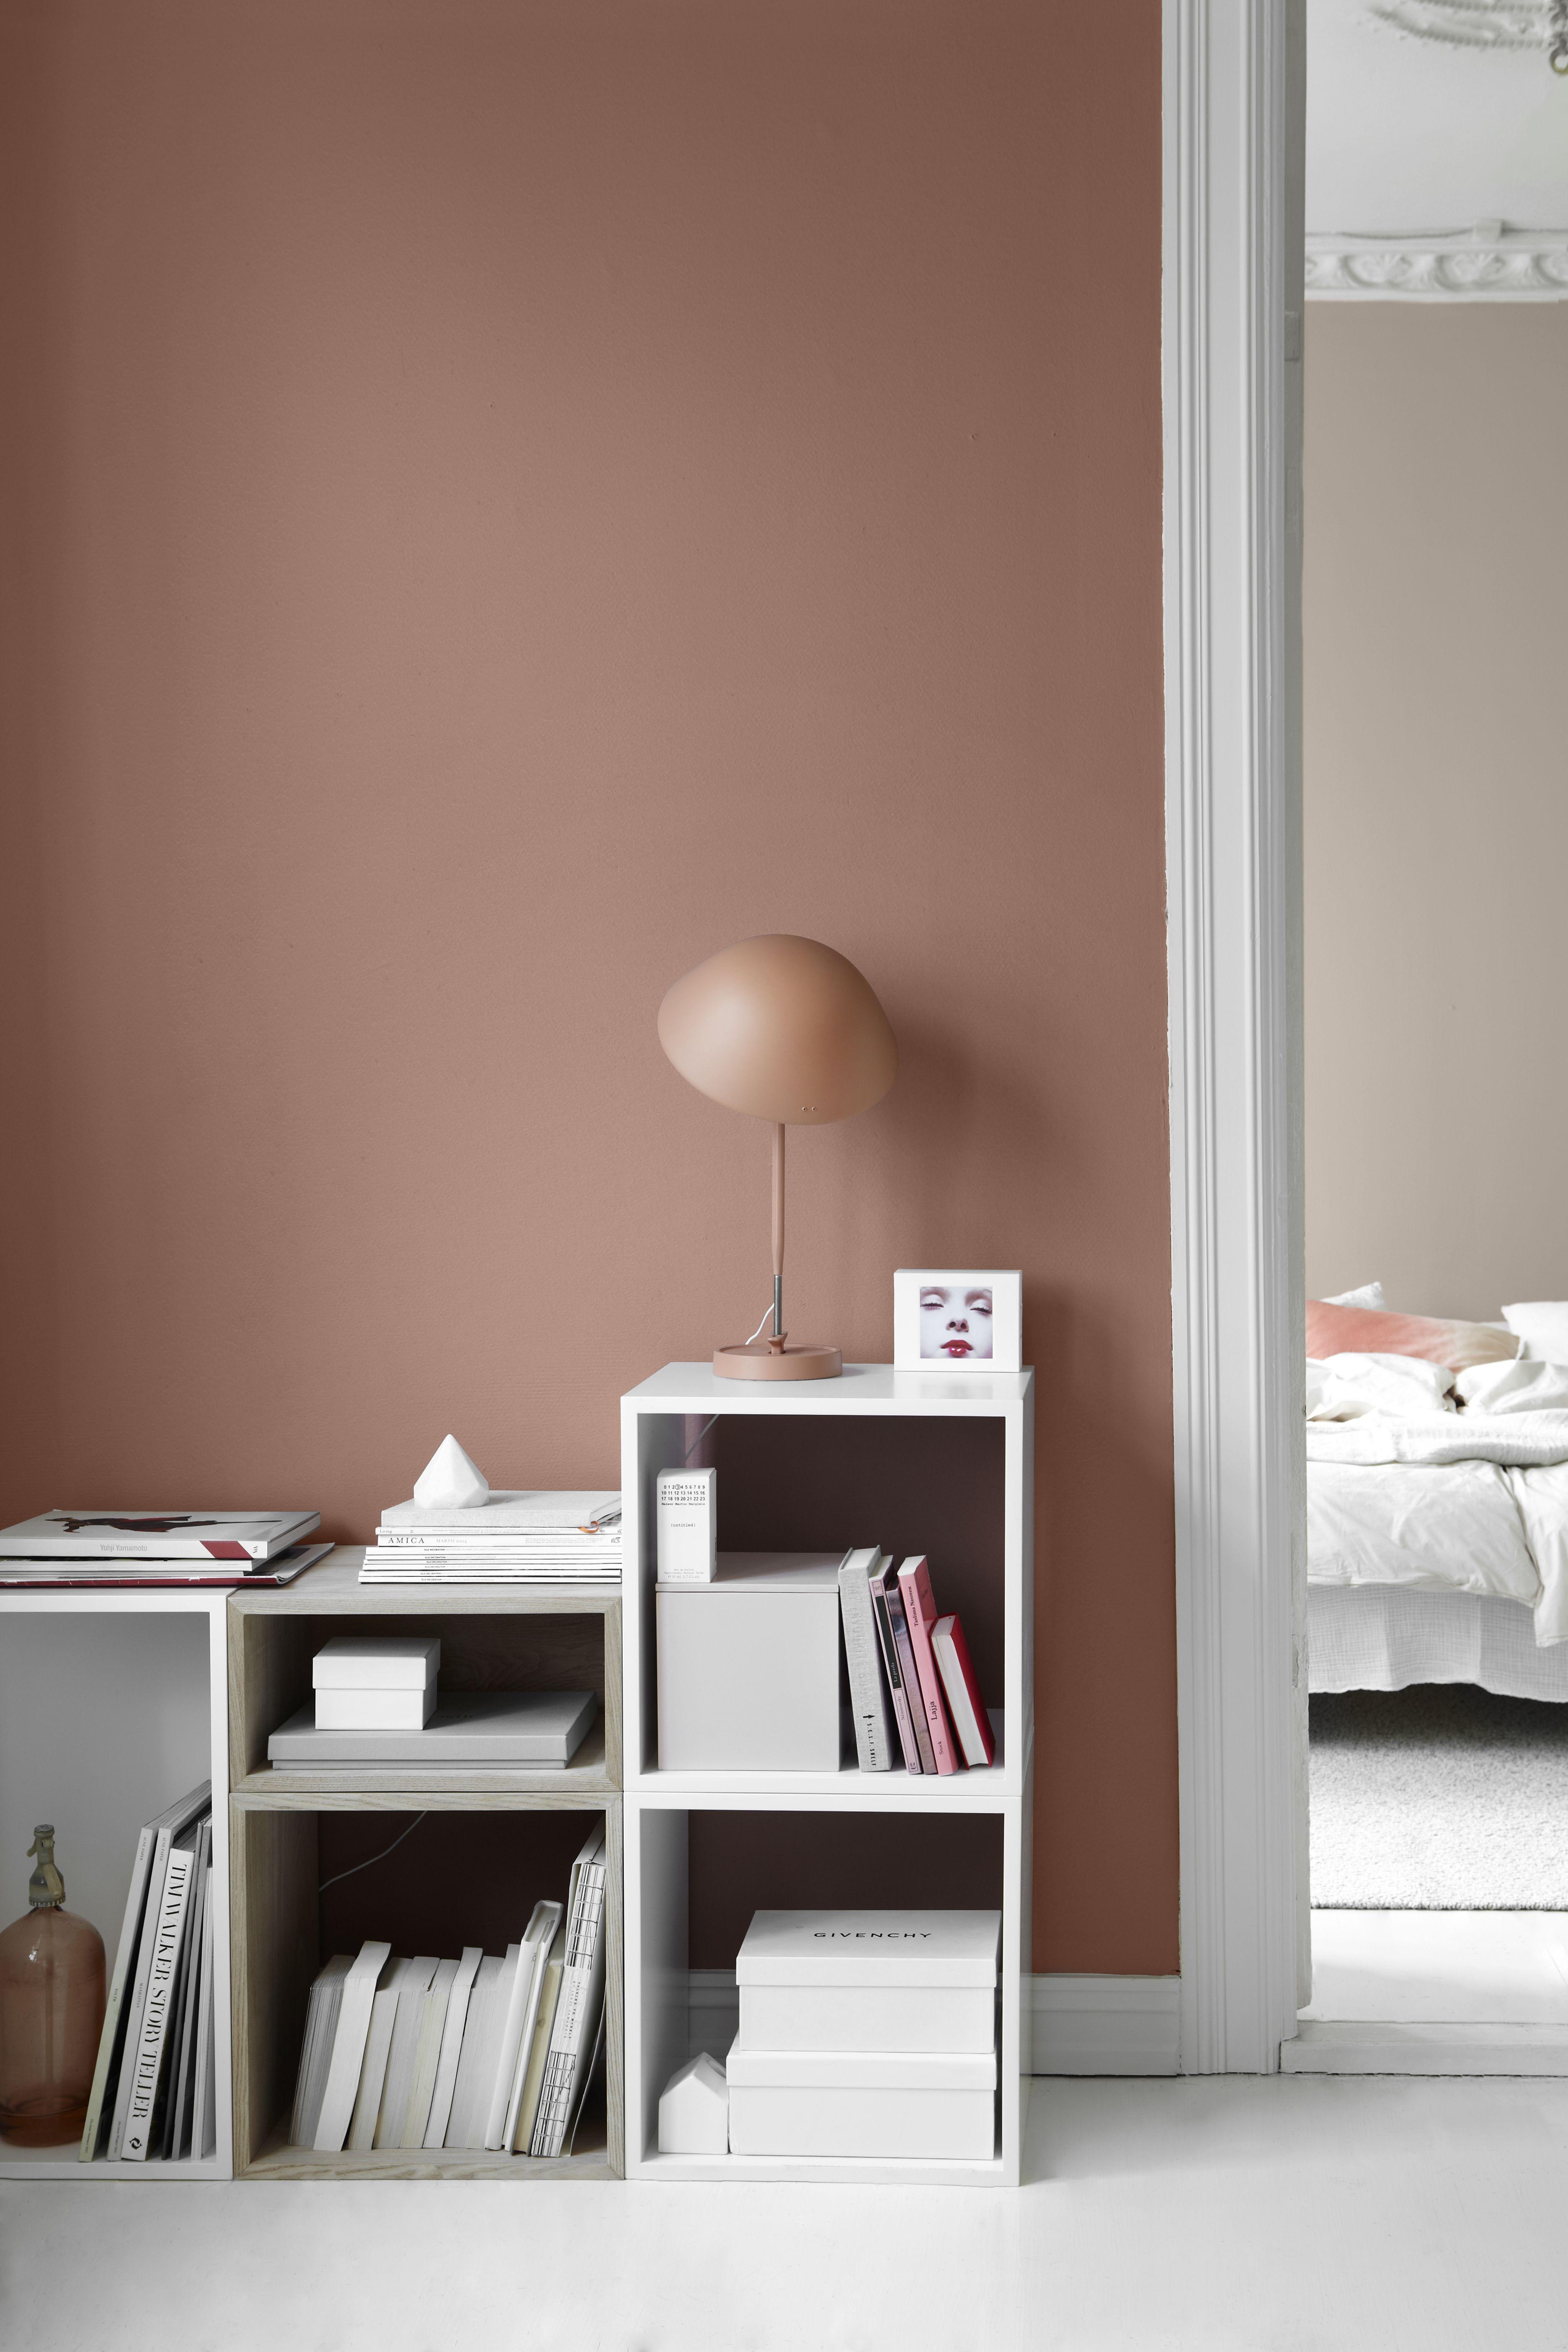 Pin By Rawan Saad On دهانات Interior Wall Colors Wall Tiles Design Living Room Decor On A Budget